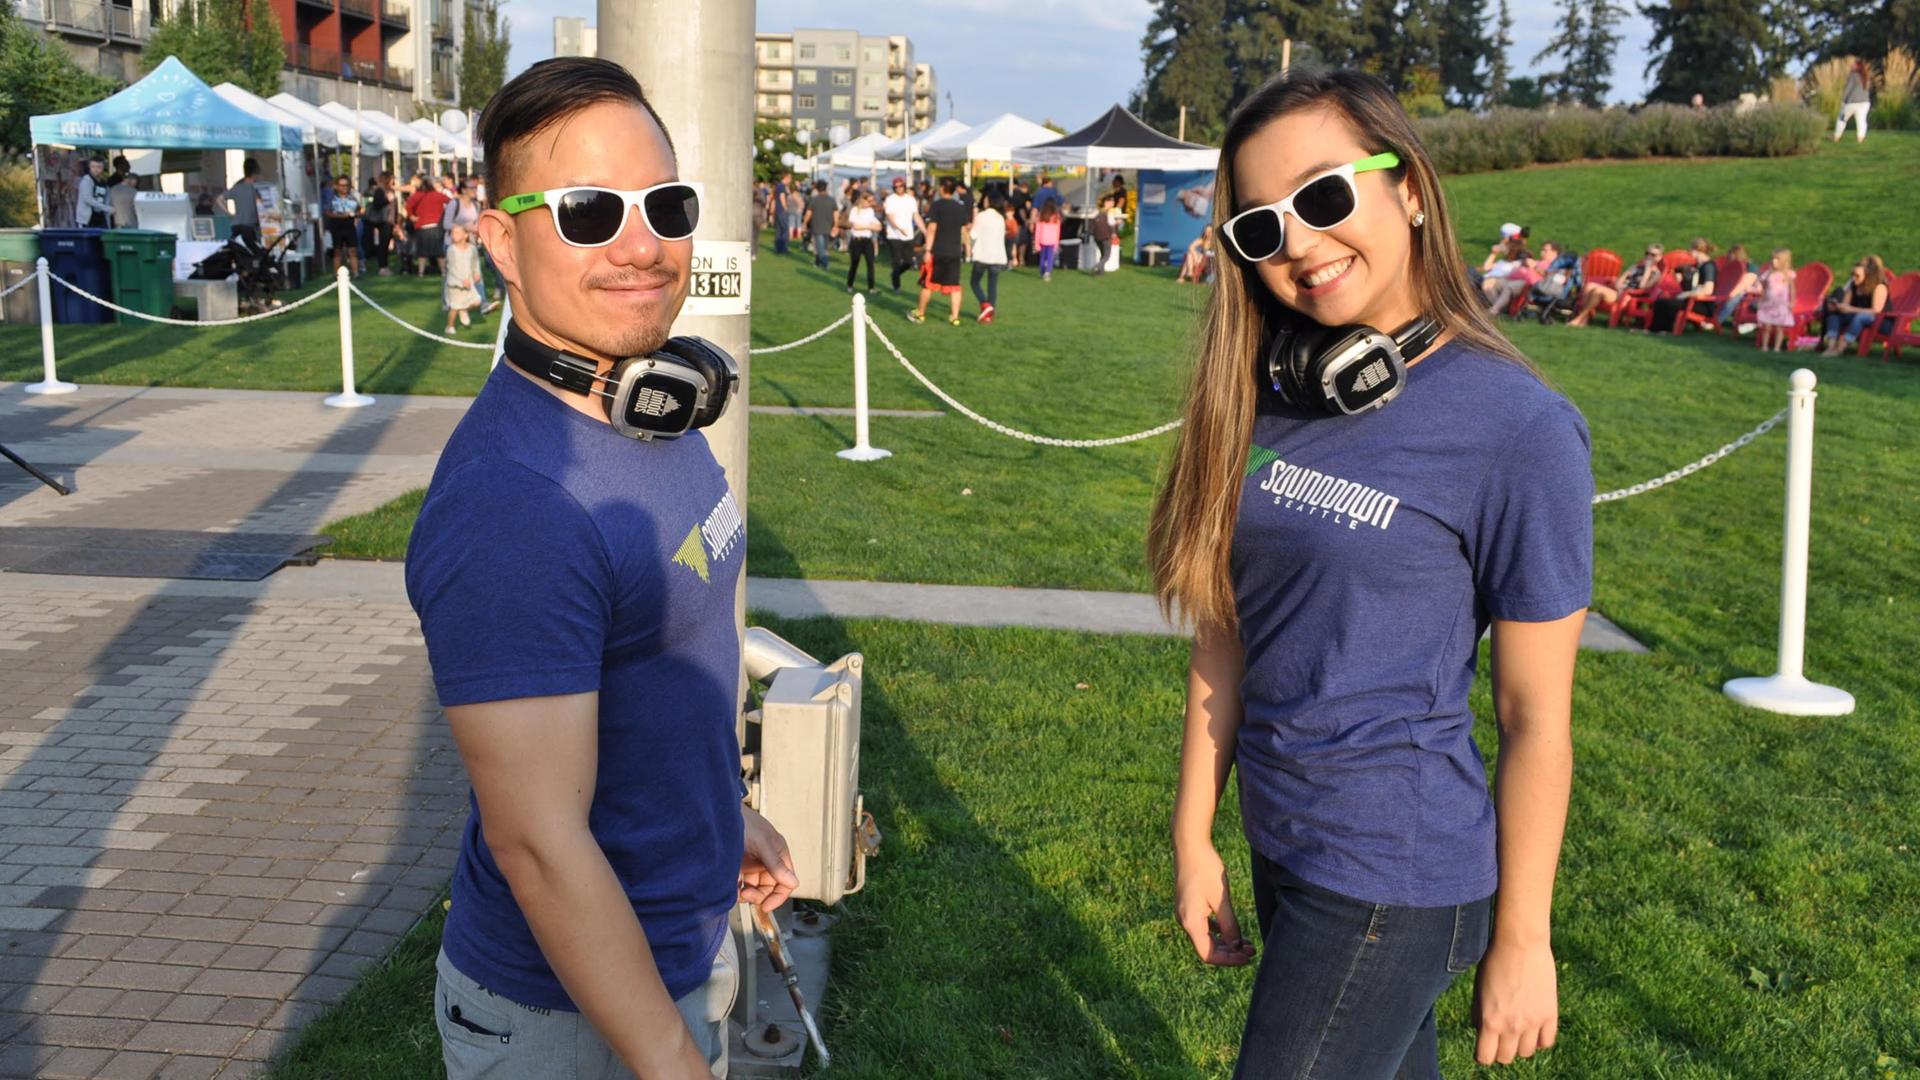 sounddown seattle silent disco event staff